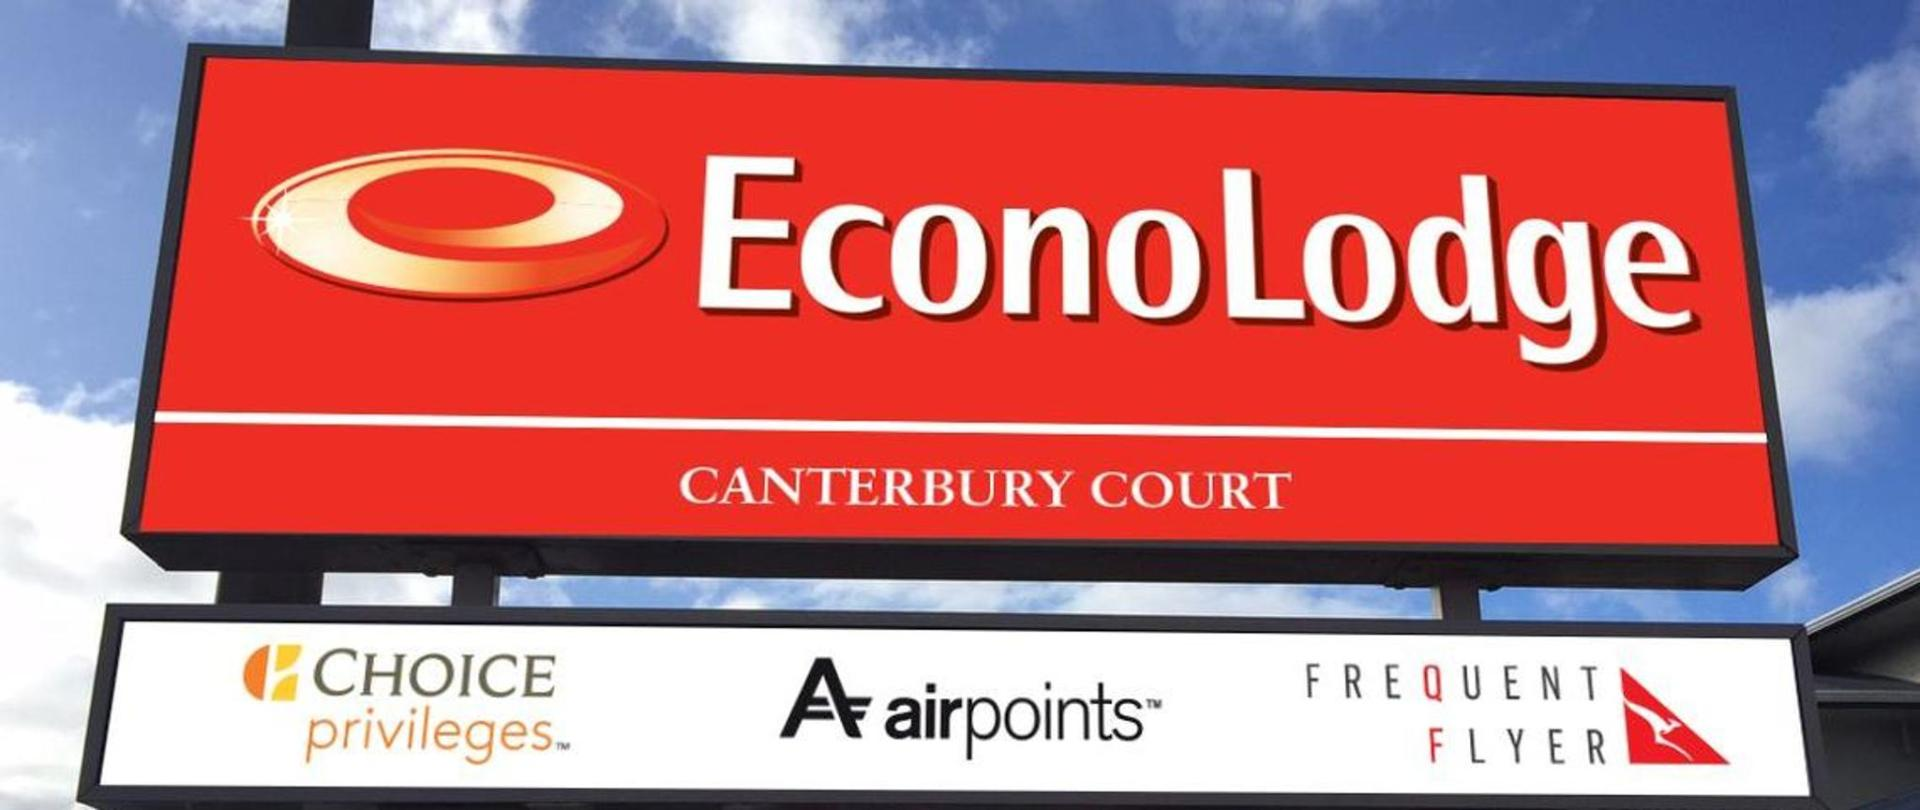 el_canterbury_court_mockup.jpg.1140x481_39_131_9761.jpg